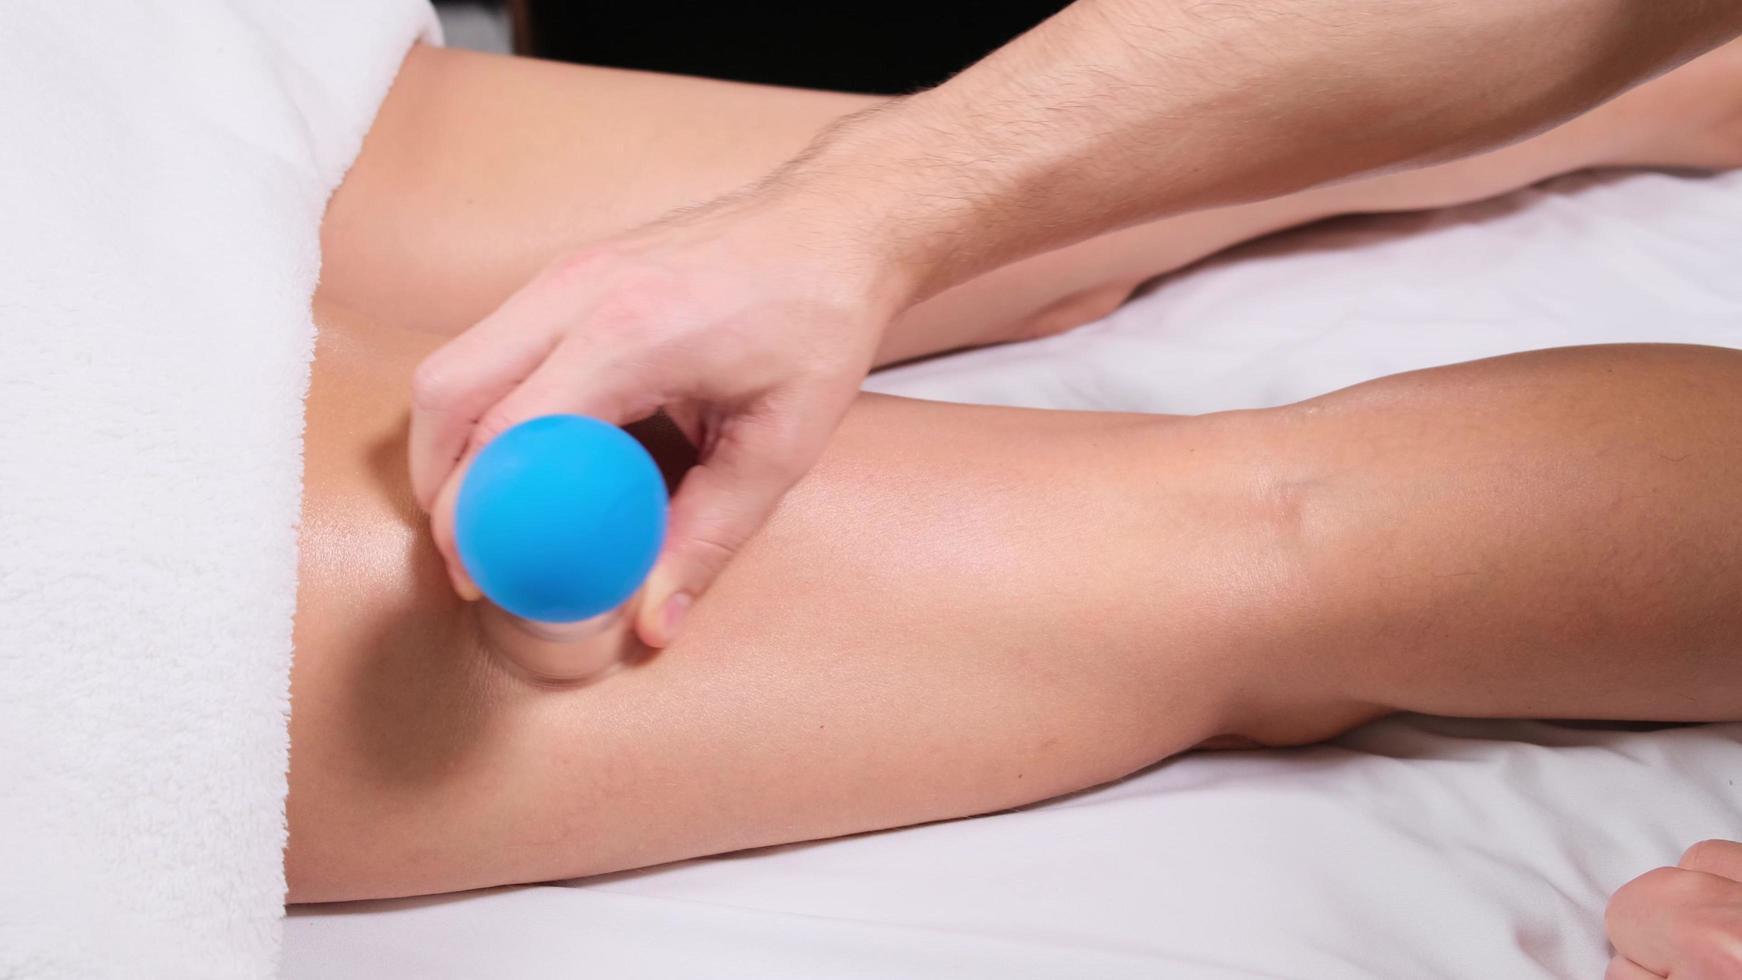 young woman receiving vacuum leg massage. masseur sets vacuum cup on leg. close up photo